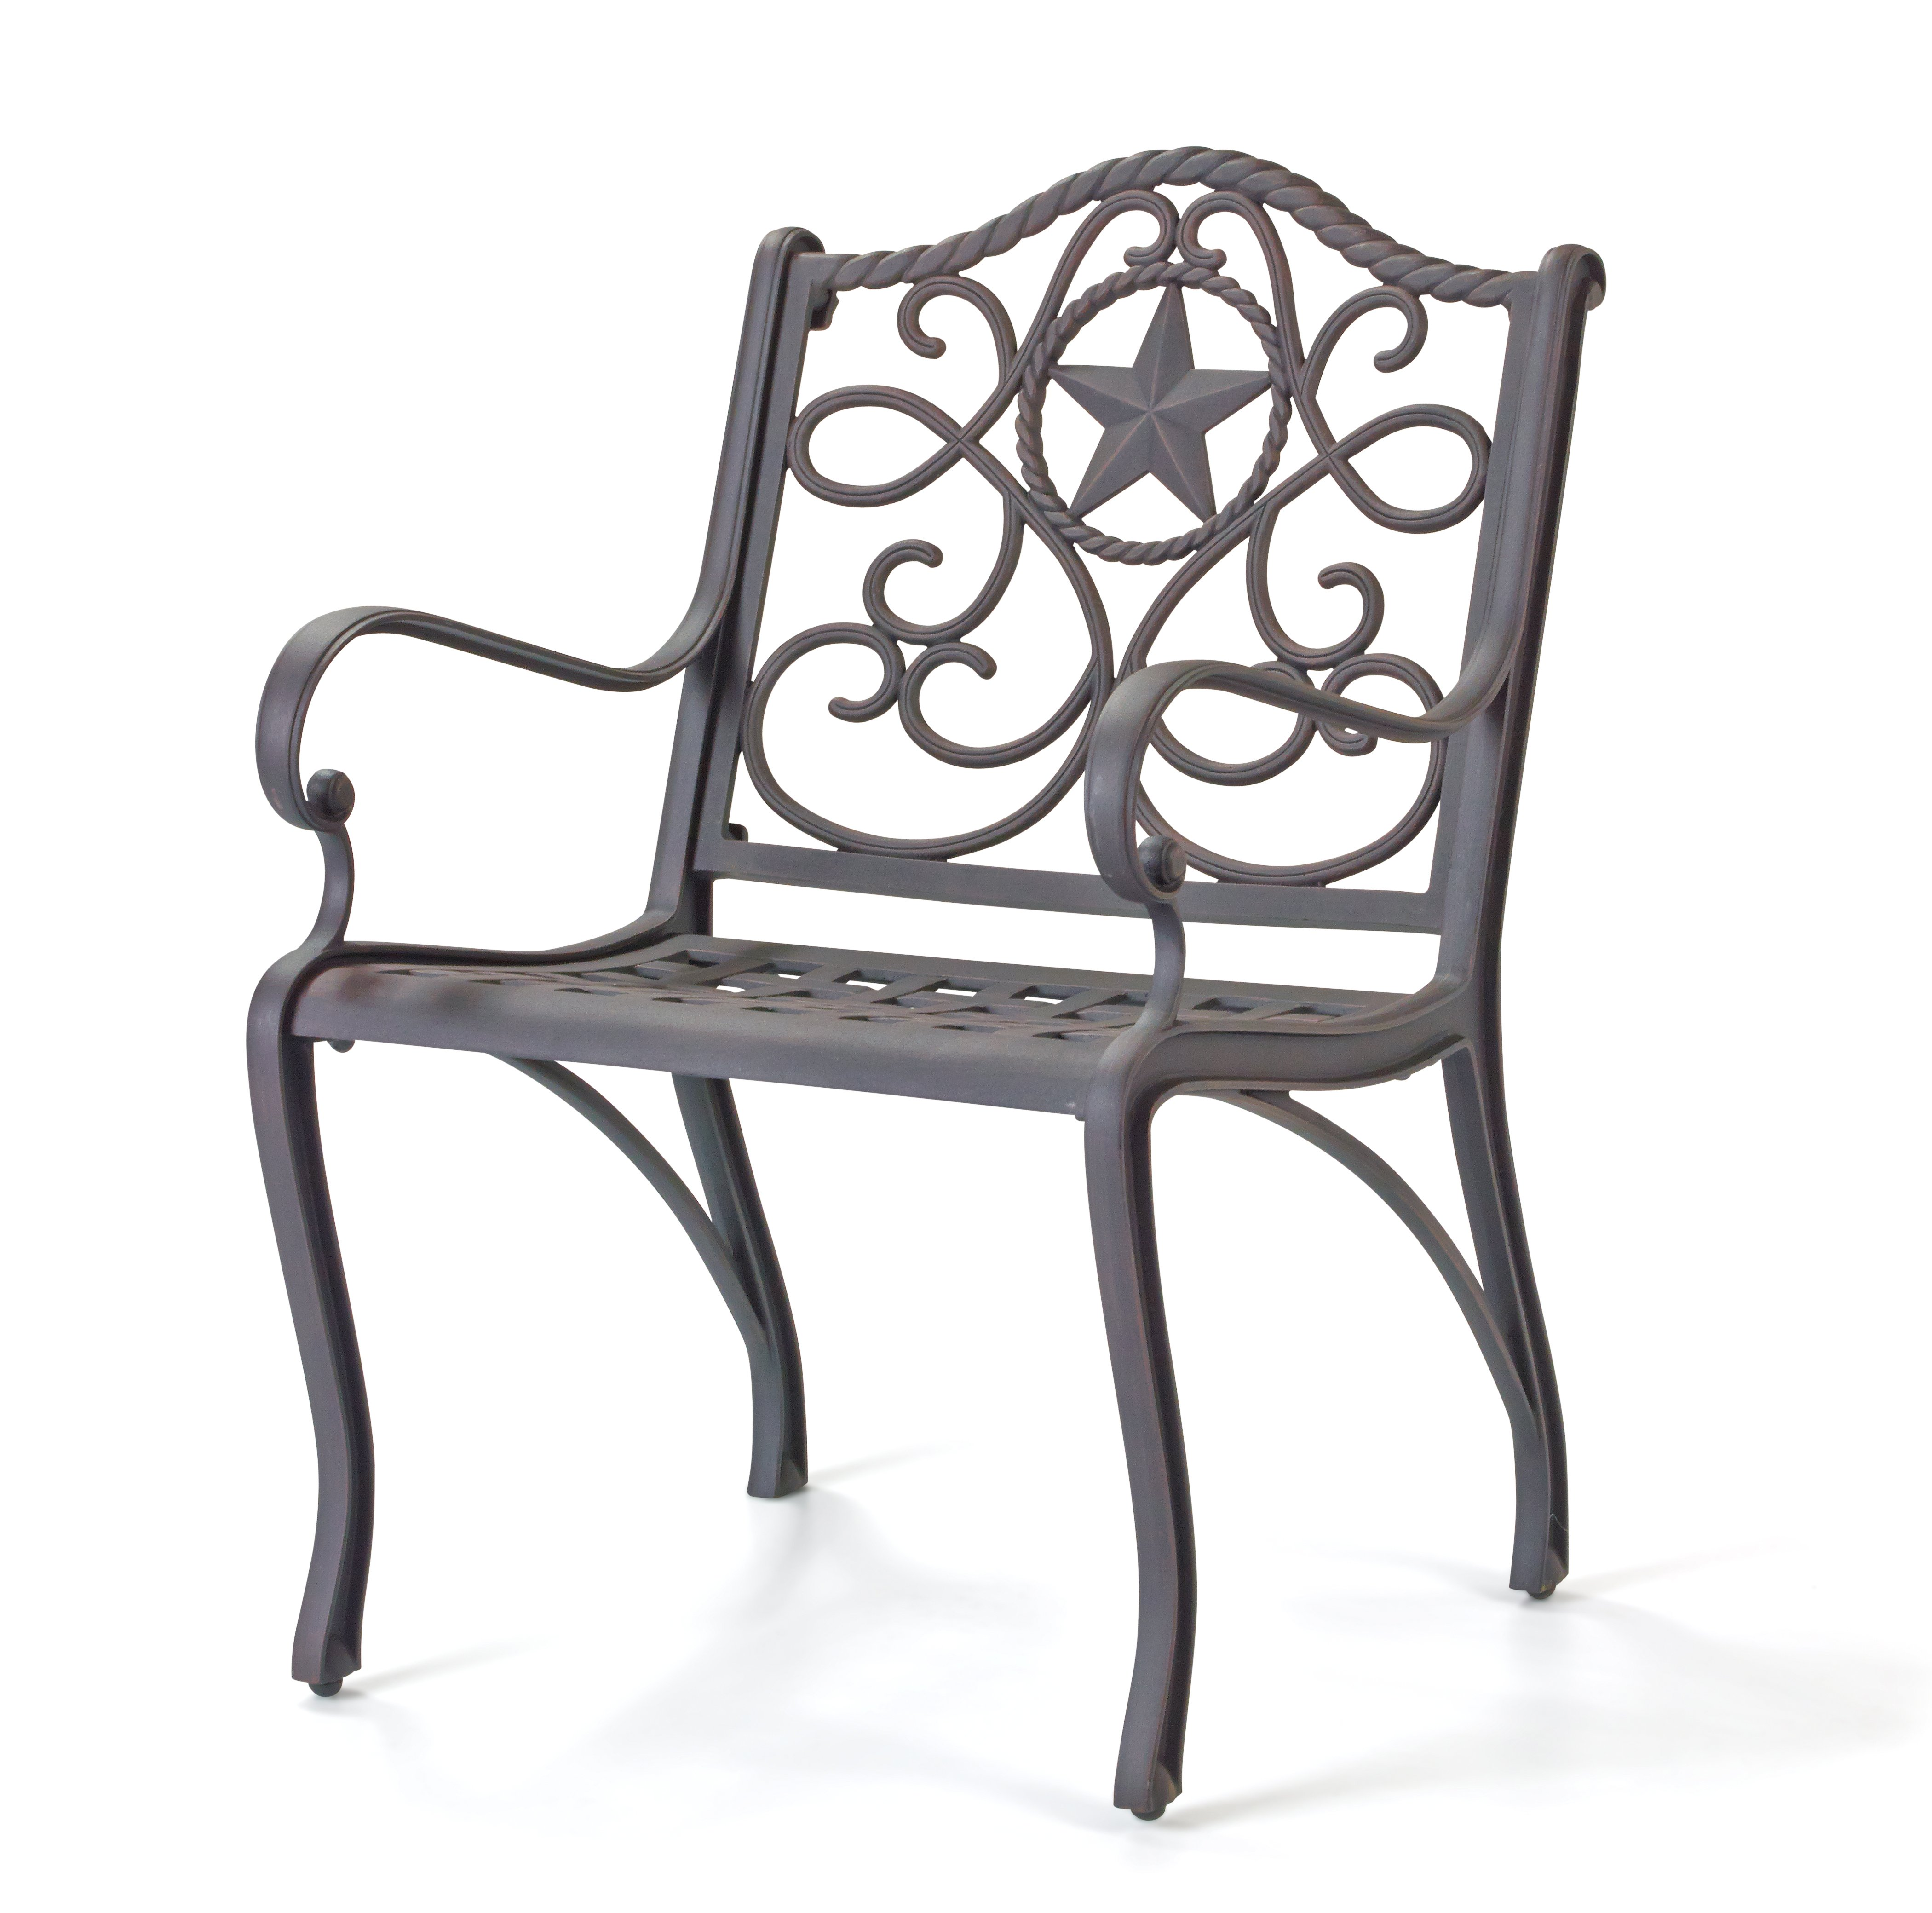 Hu2011Eu2011B Riata III Dining Chair U2011 Shop Furniture At HEB